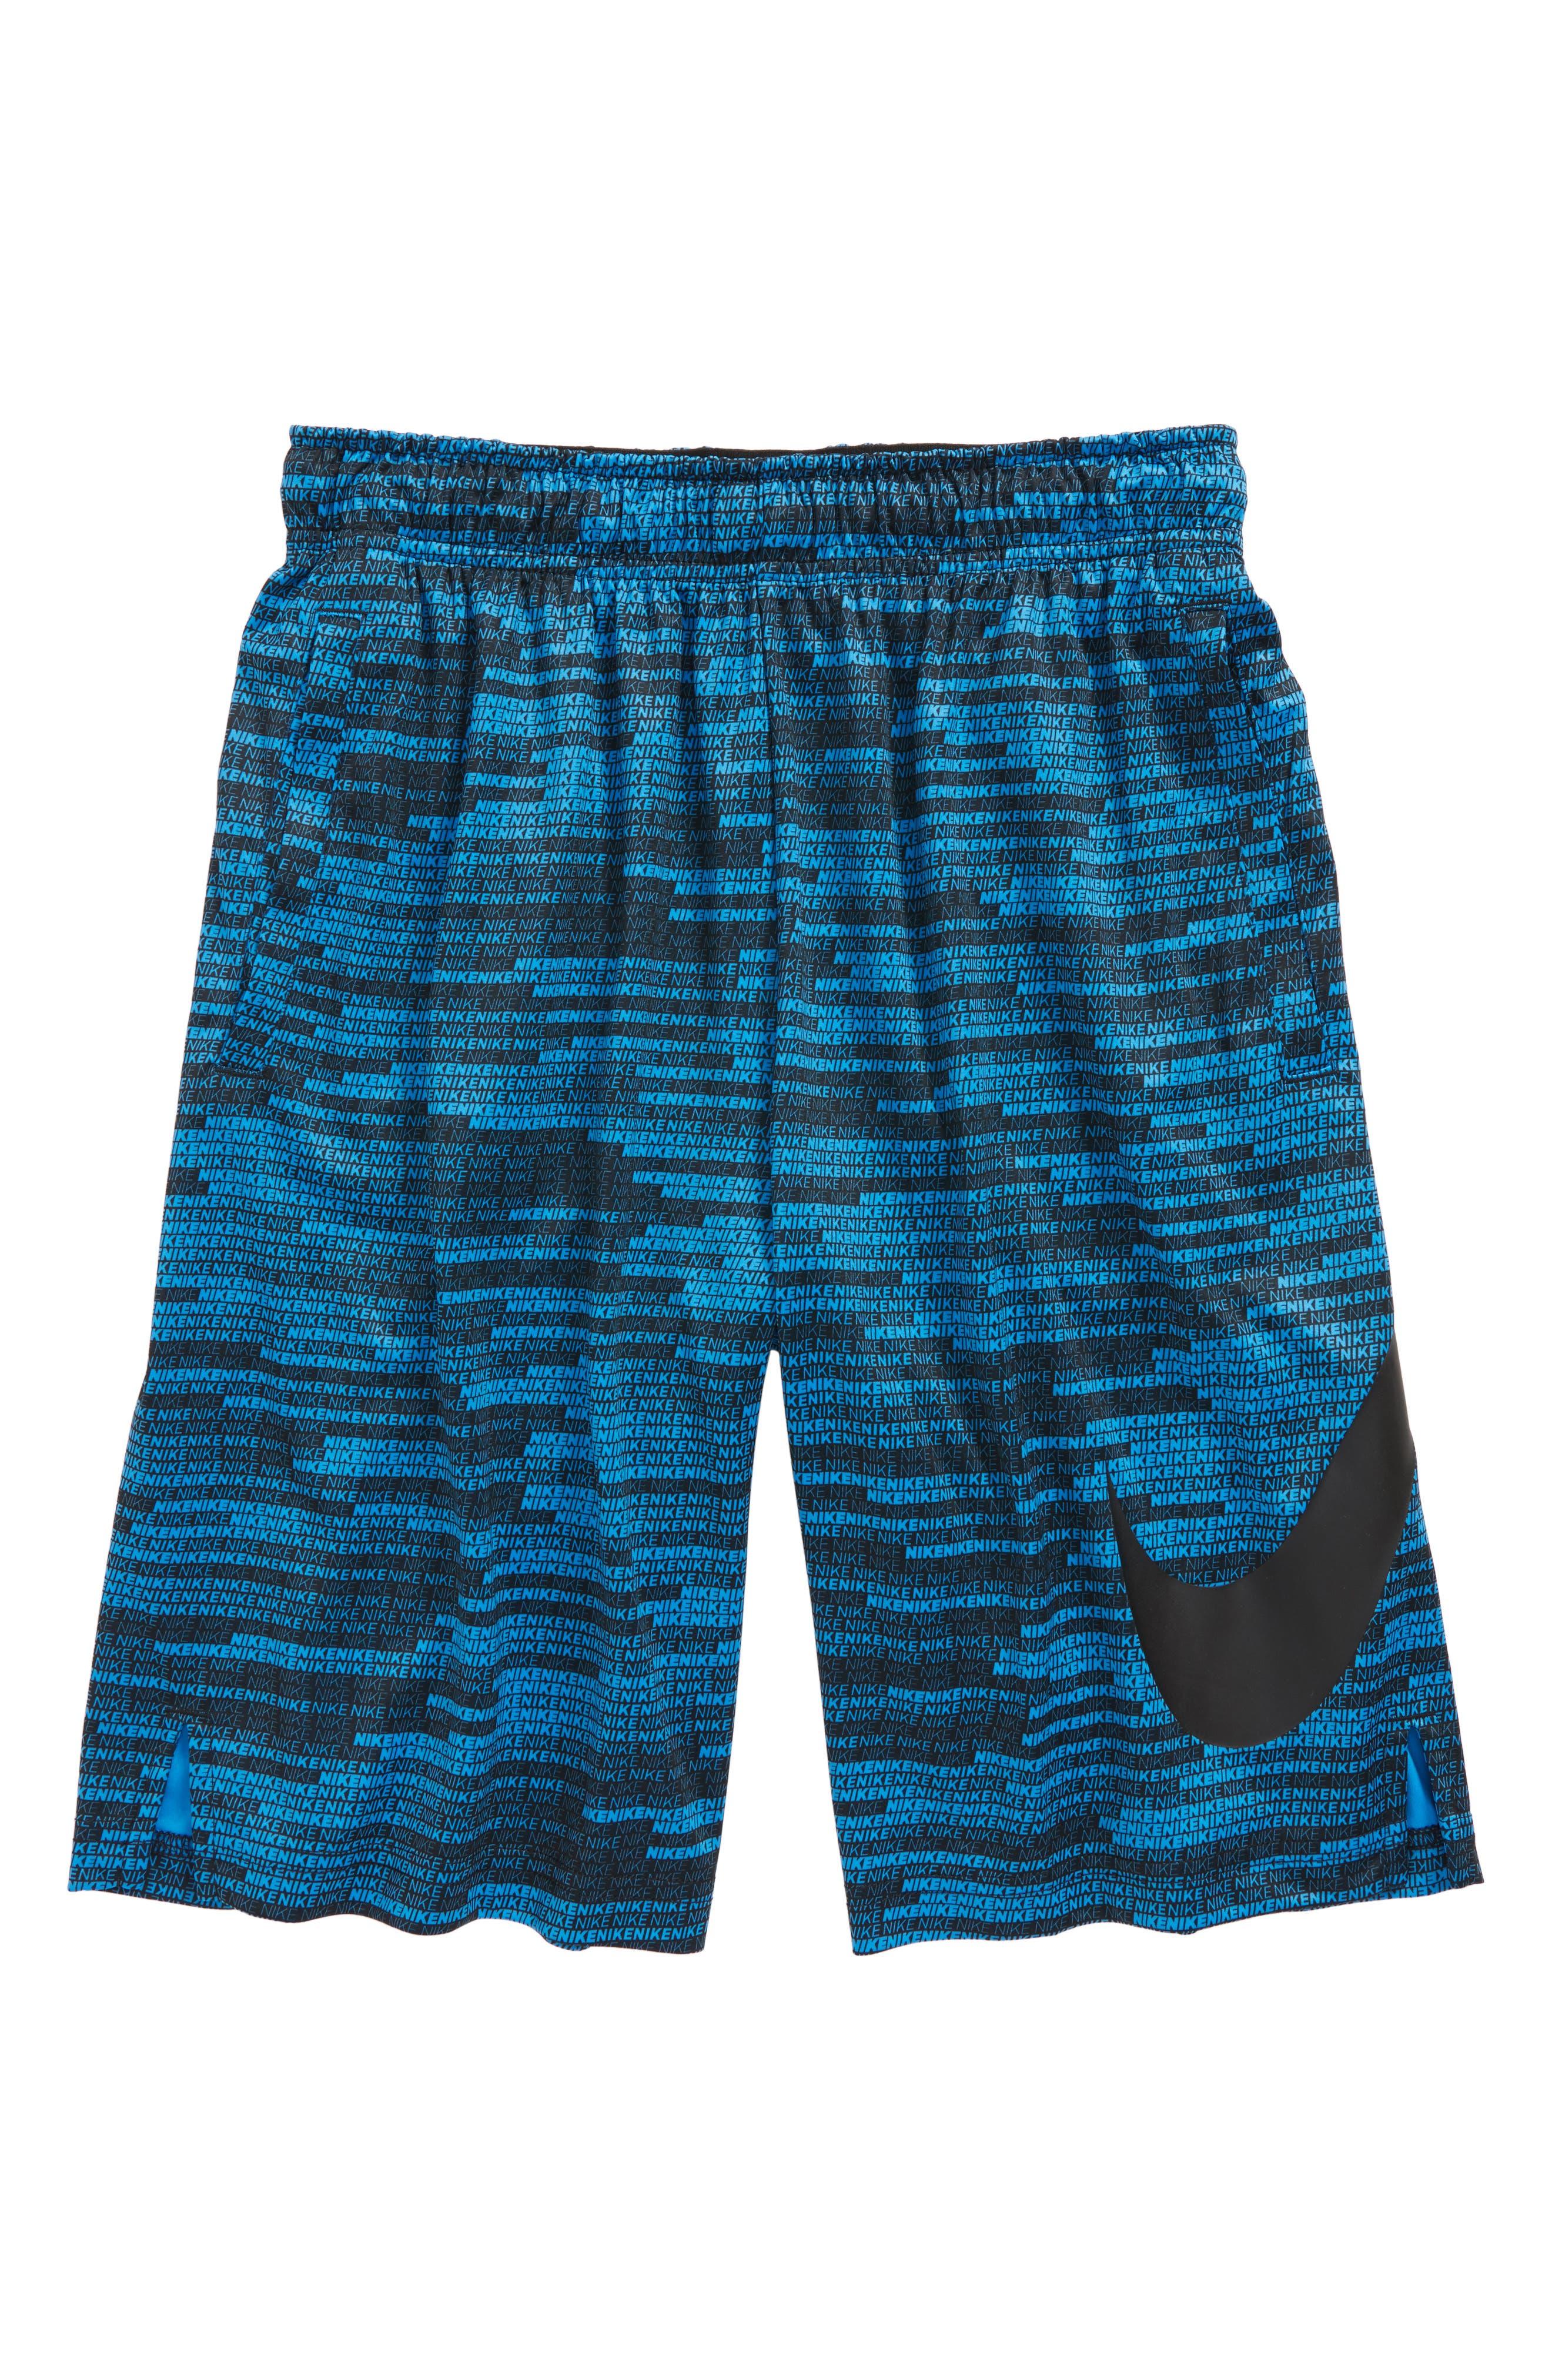 Dry Training Shorts,                         Main,                         color, Blue/ Black